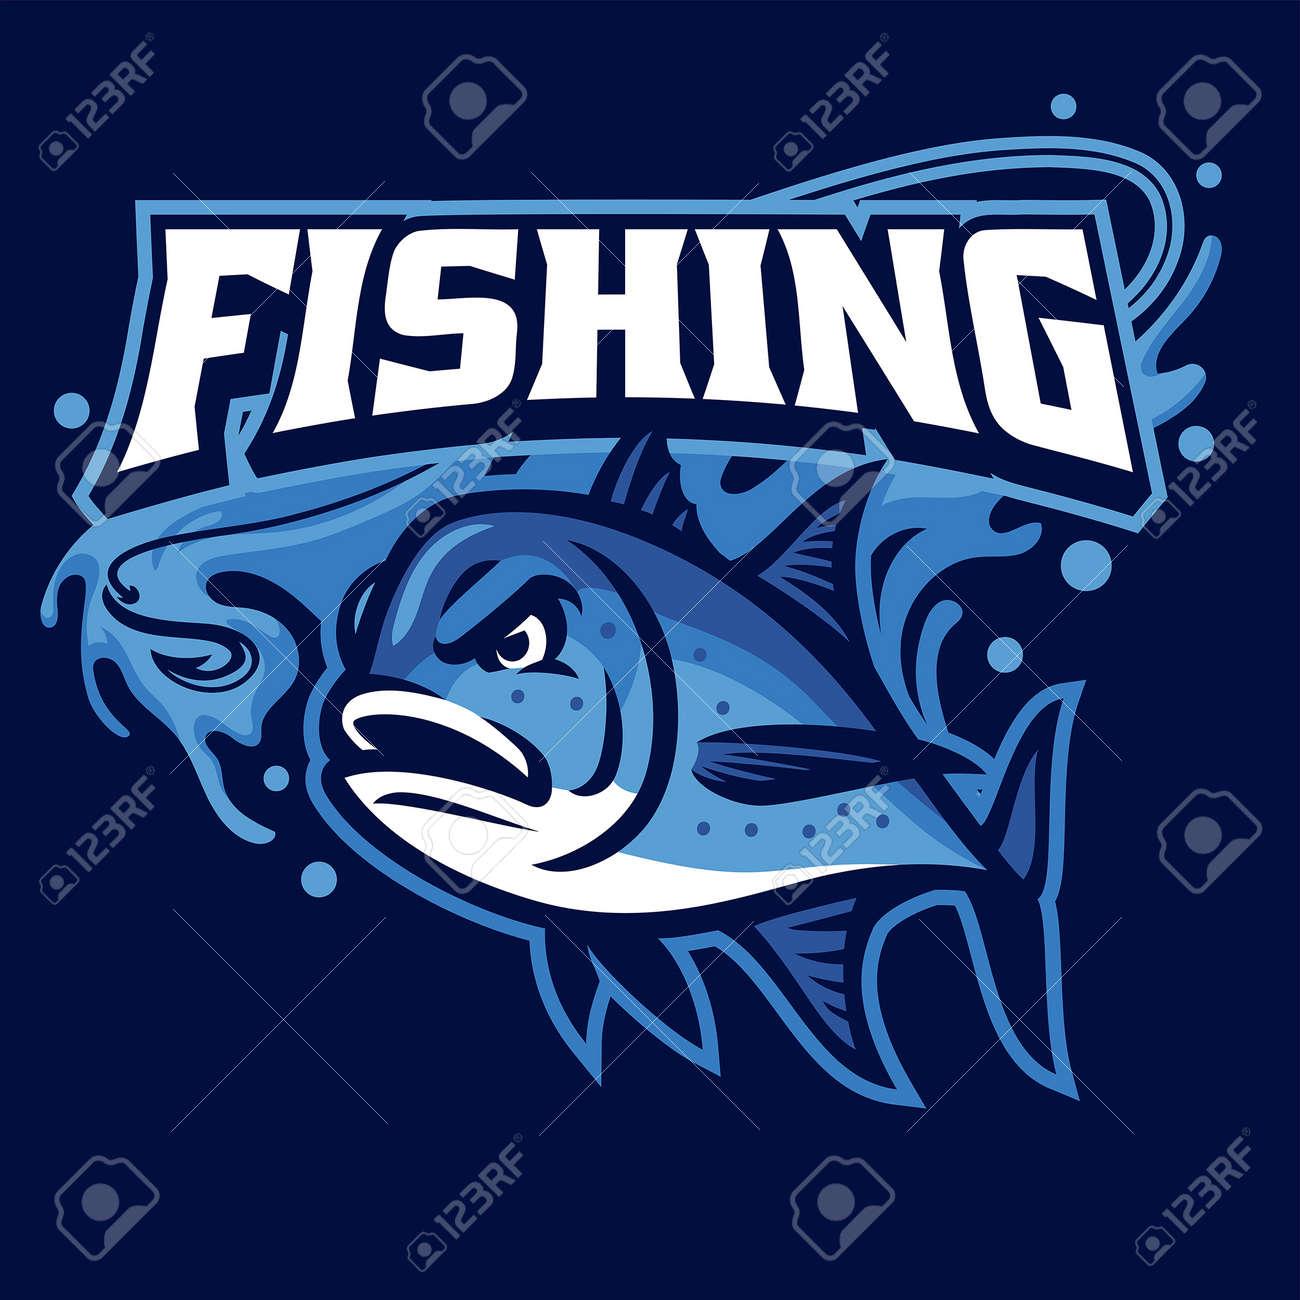 Mascot of fishing giant trevally - 169099736